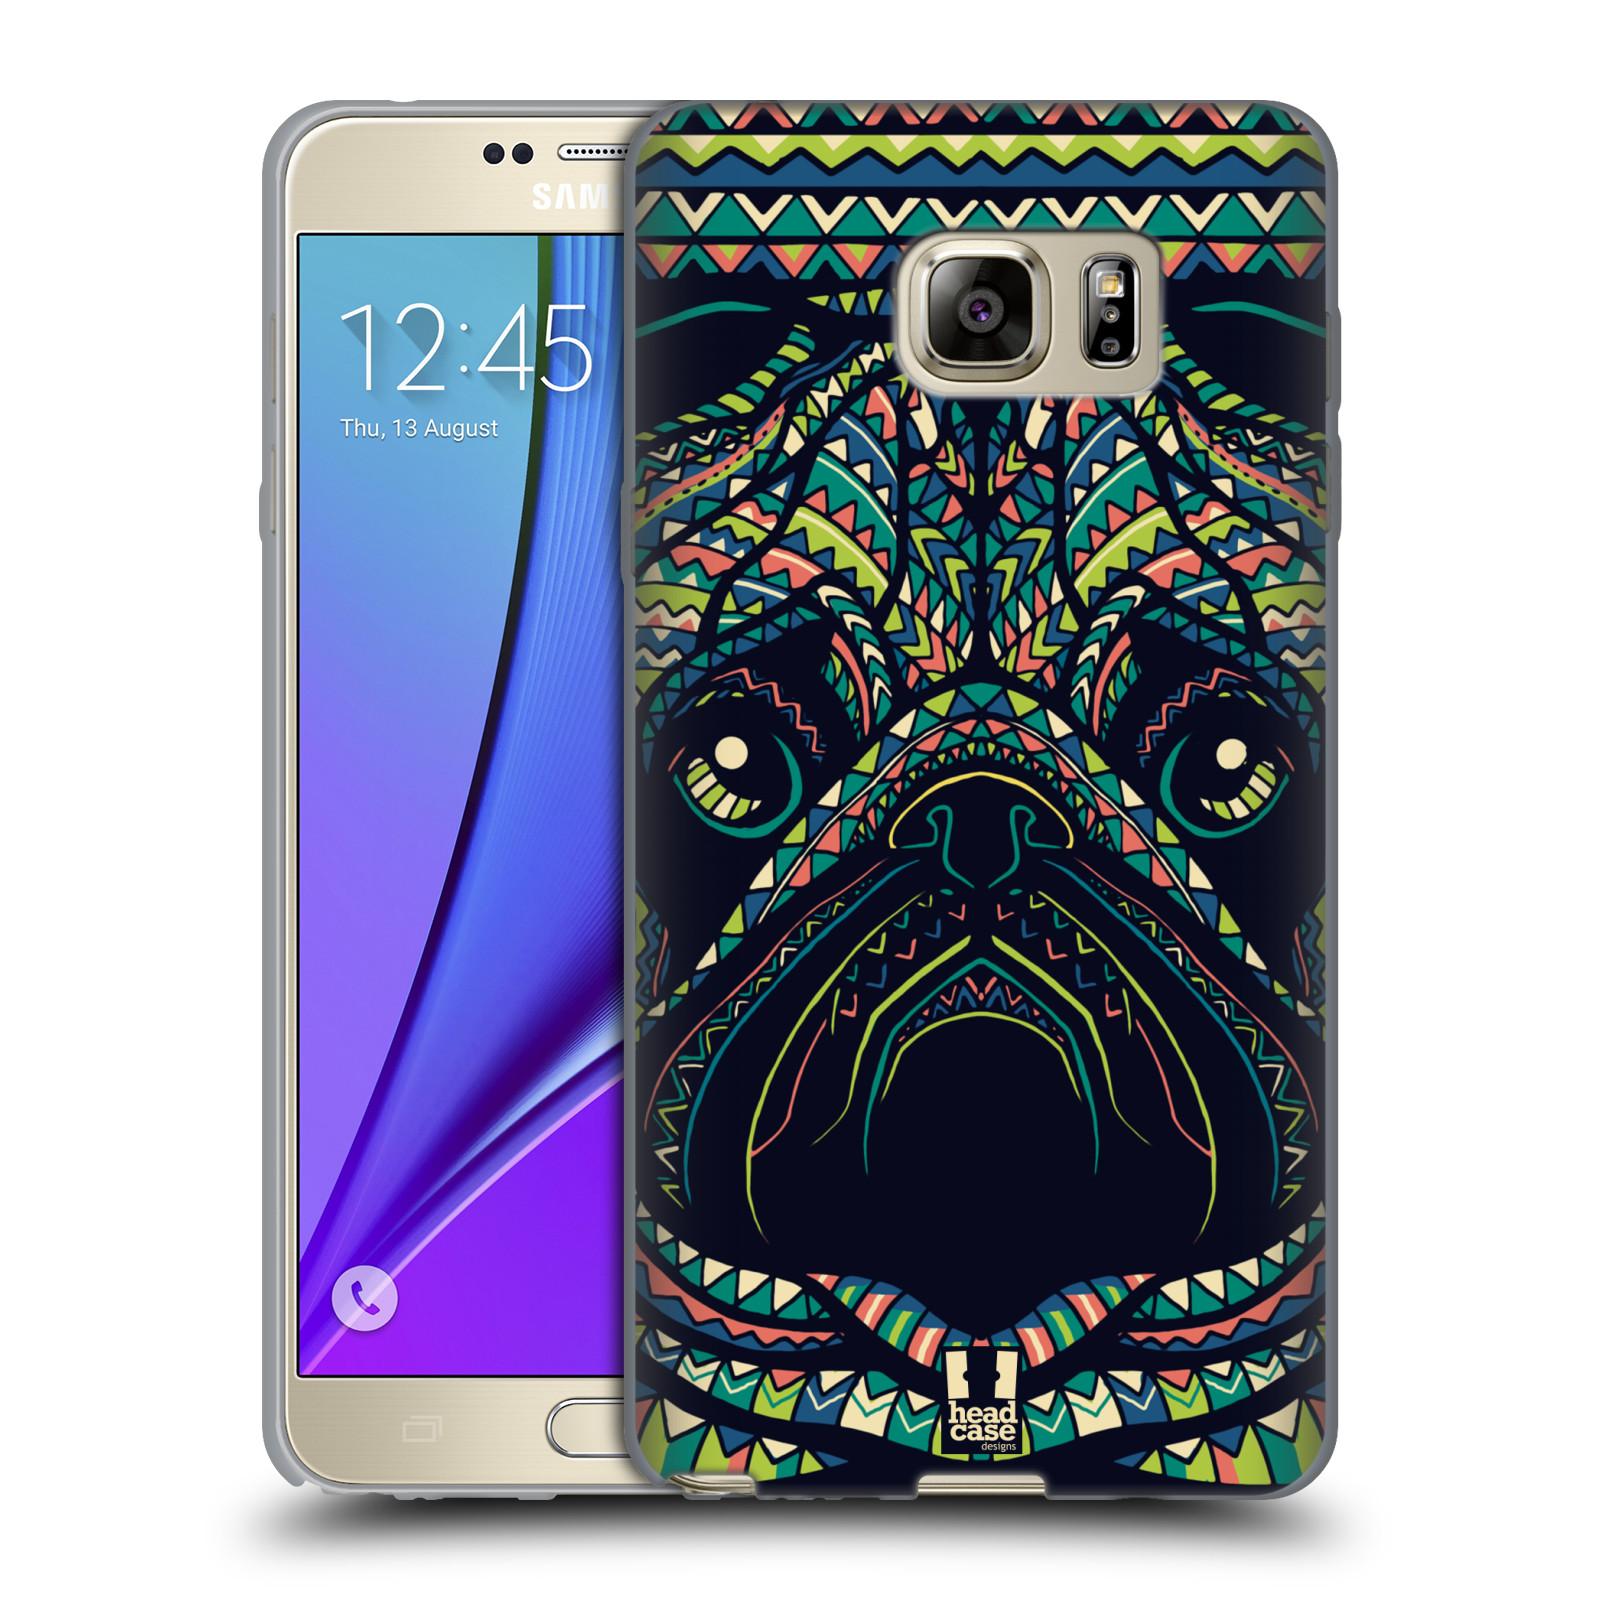 HEAD CASE silikonový obal na mobil Samsung Galaxy Note 5 (N920) vzor Aztécký motiv zvíře 3 mopsík